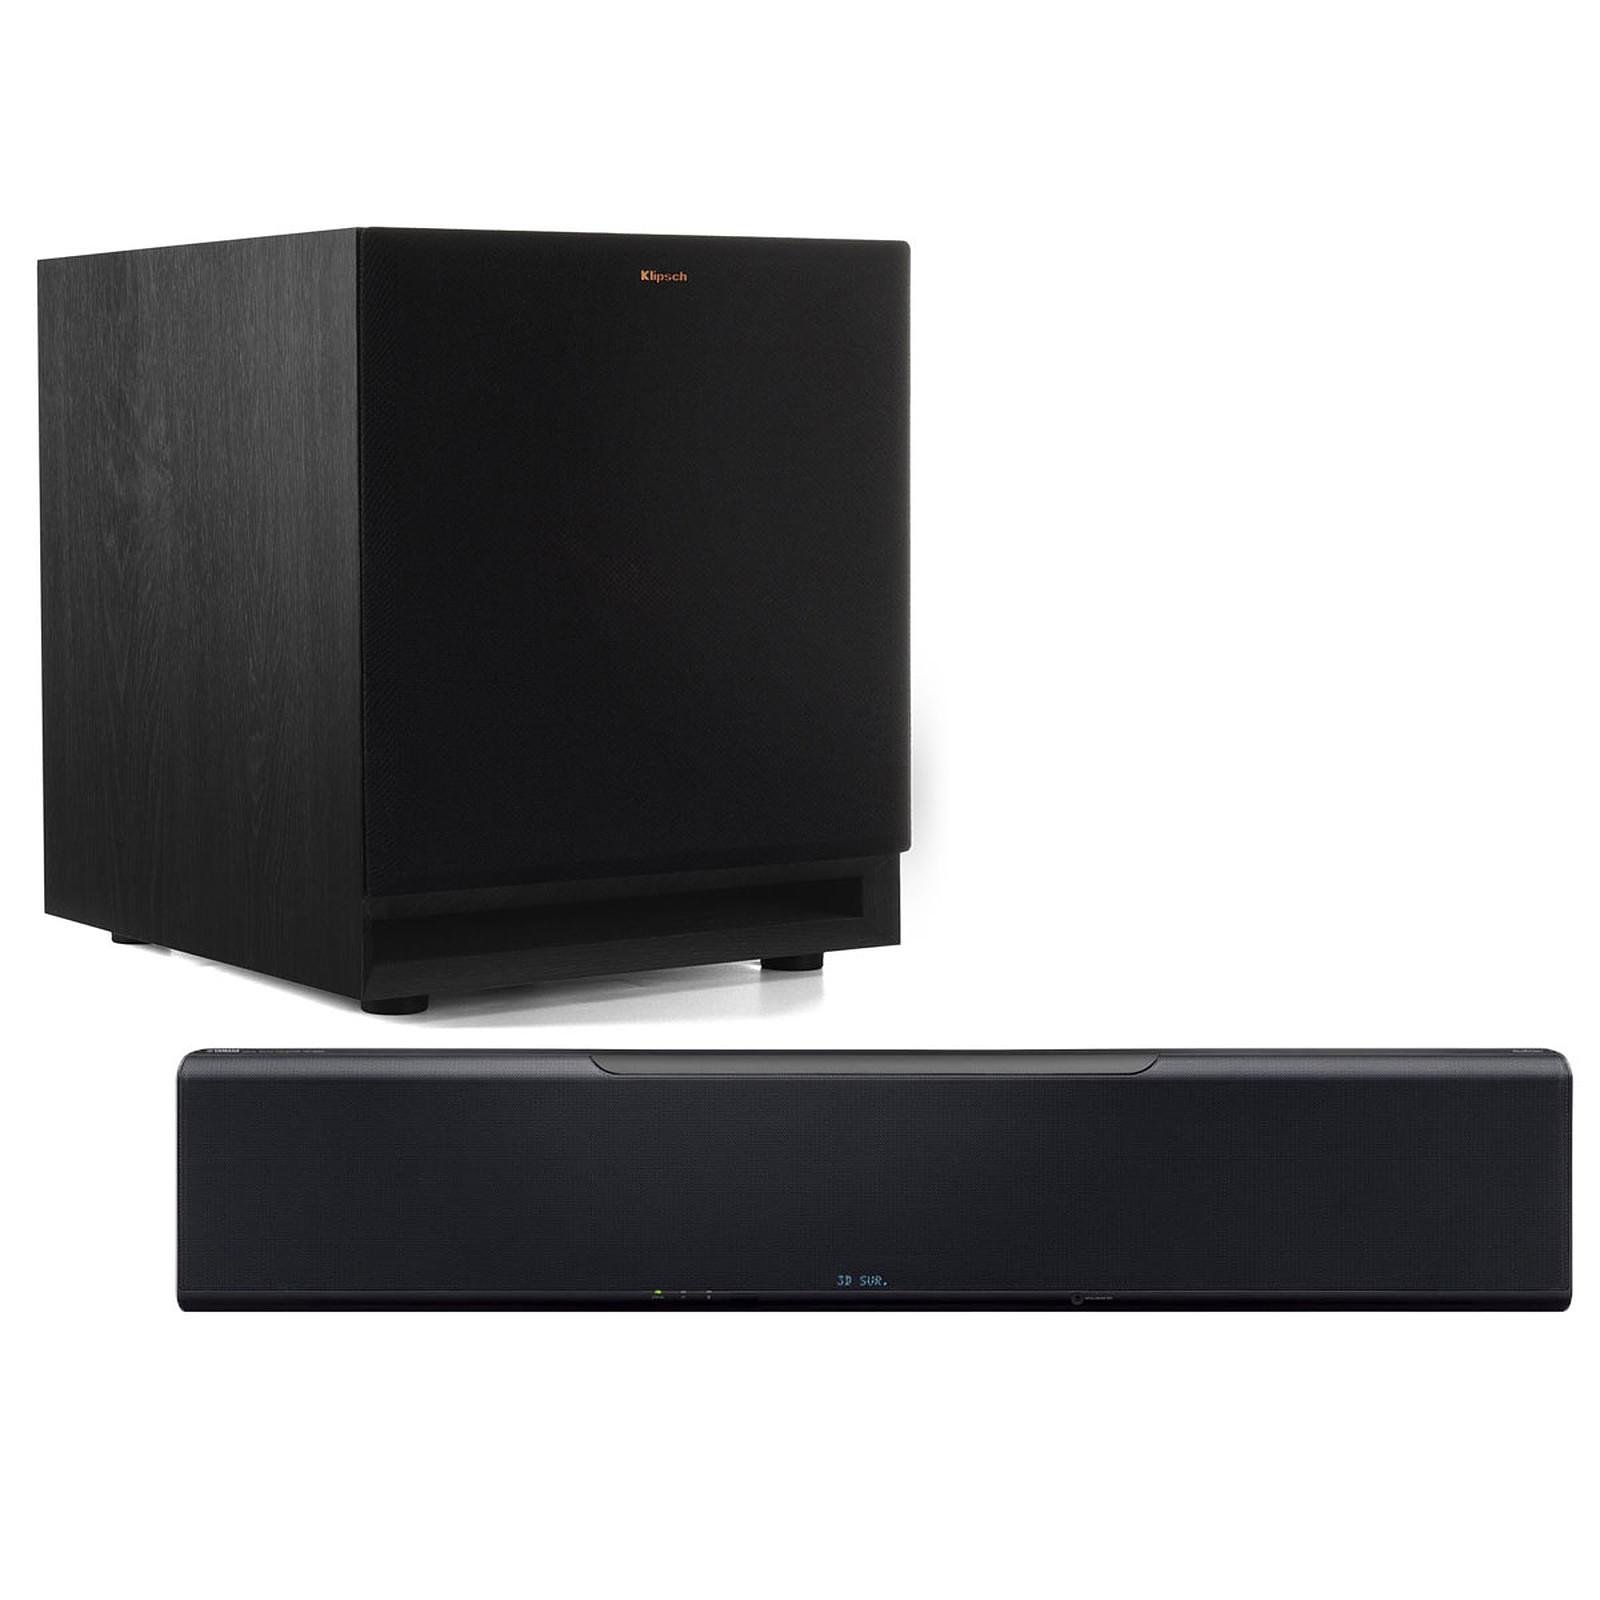 Yamaha MusicCast YSP-5600 + Klipsch SPL-100